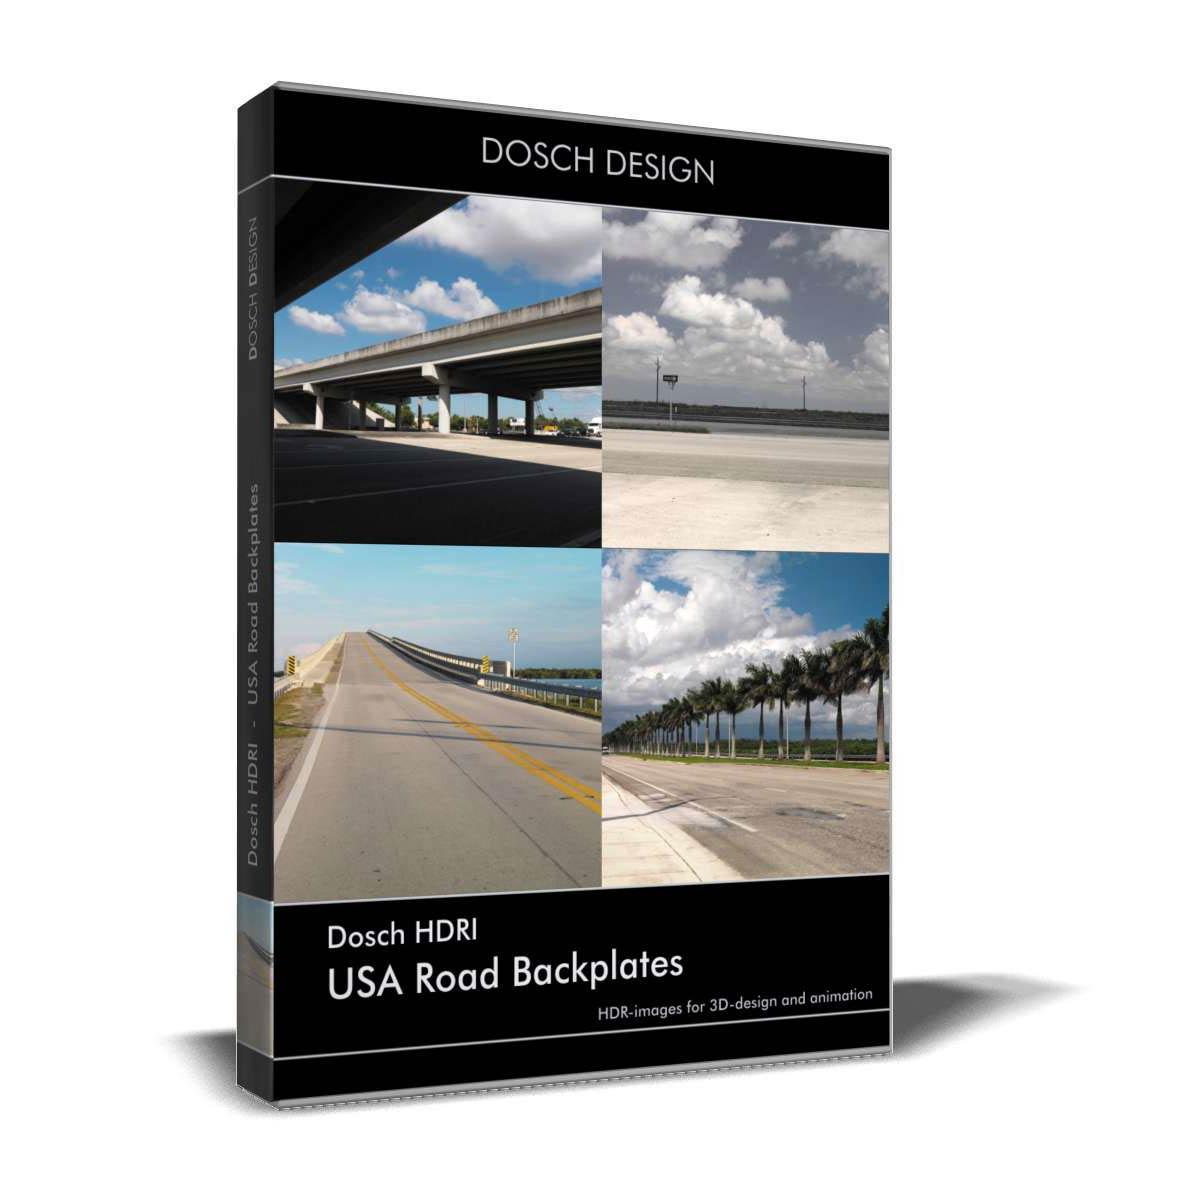 Download Dosch HDRI USA Road Backplates